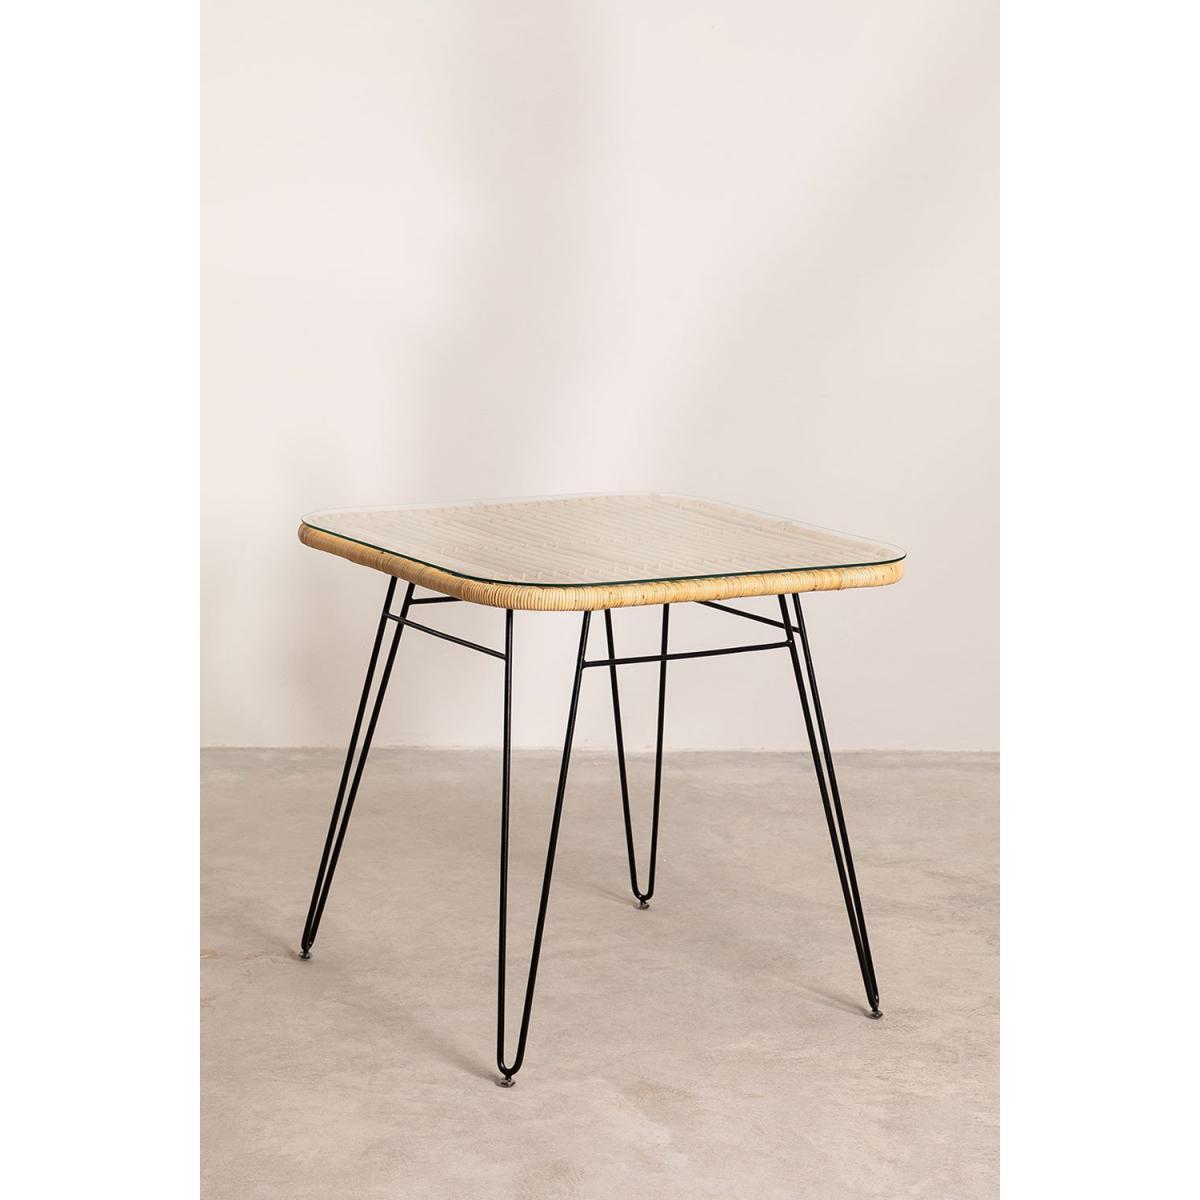 Stylez Table rotin verre metal